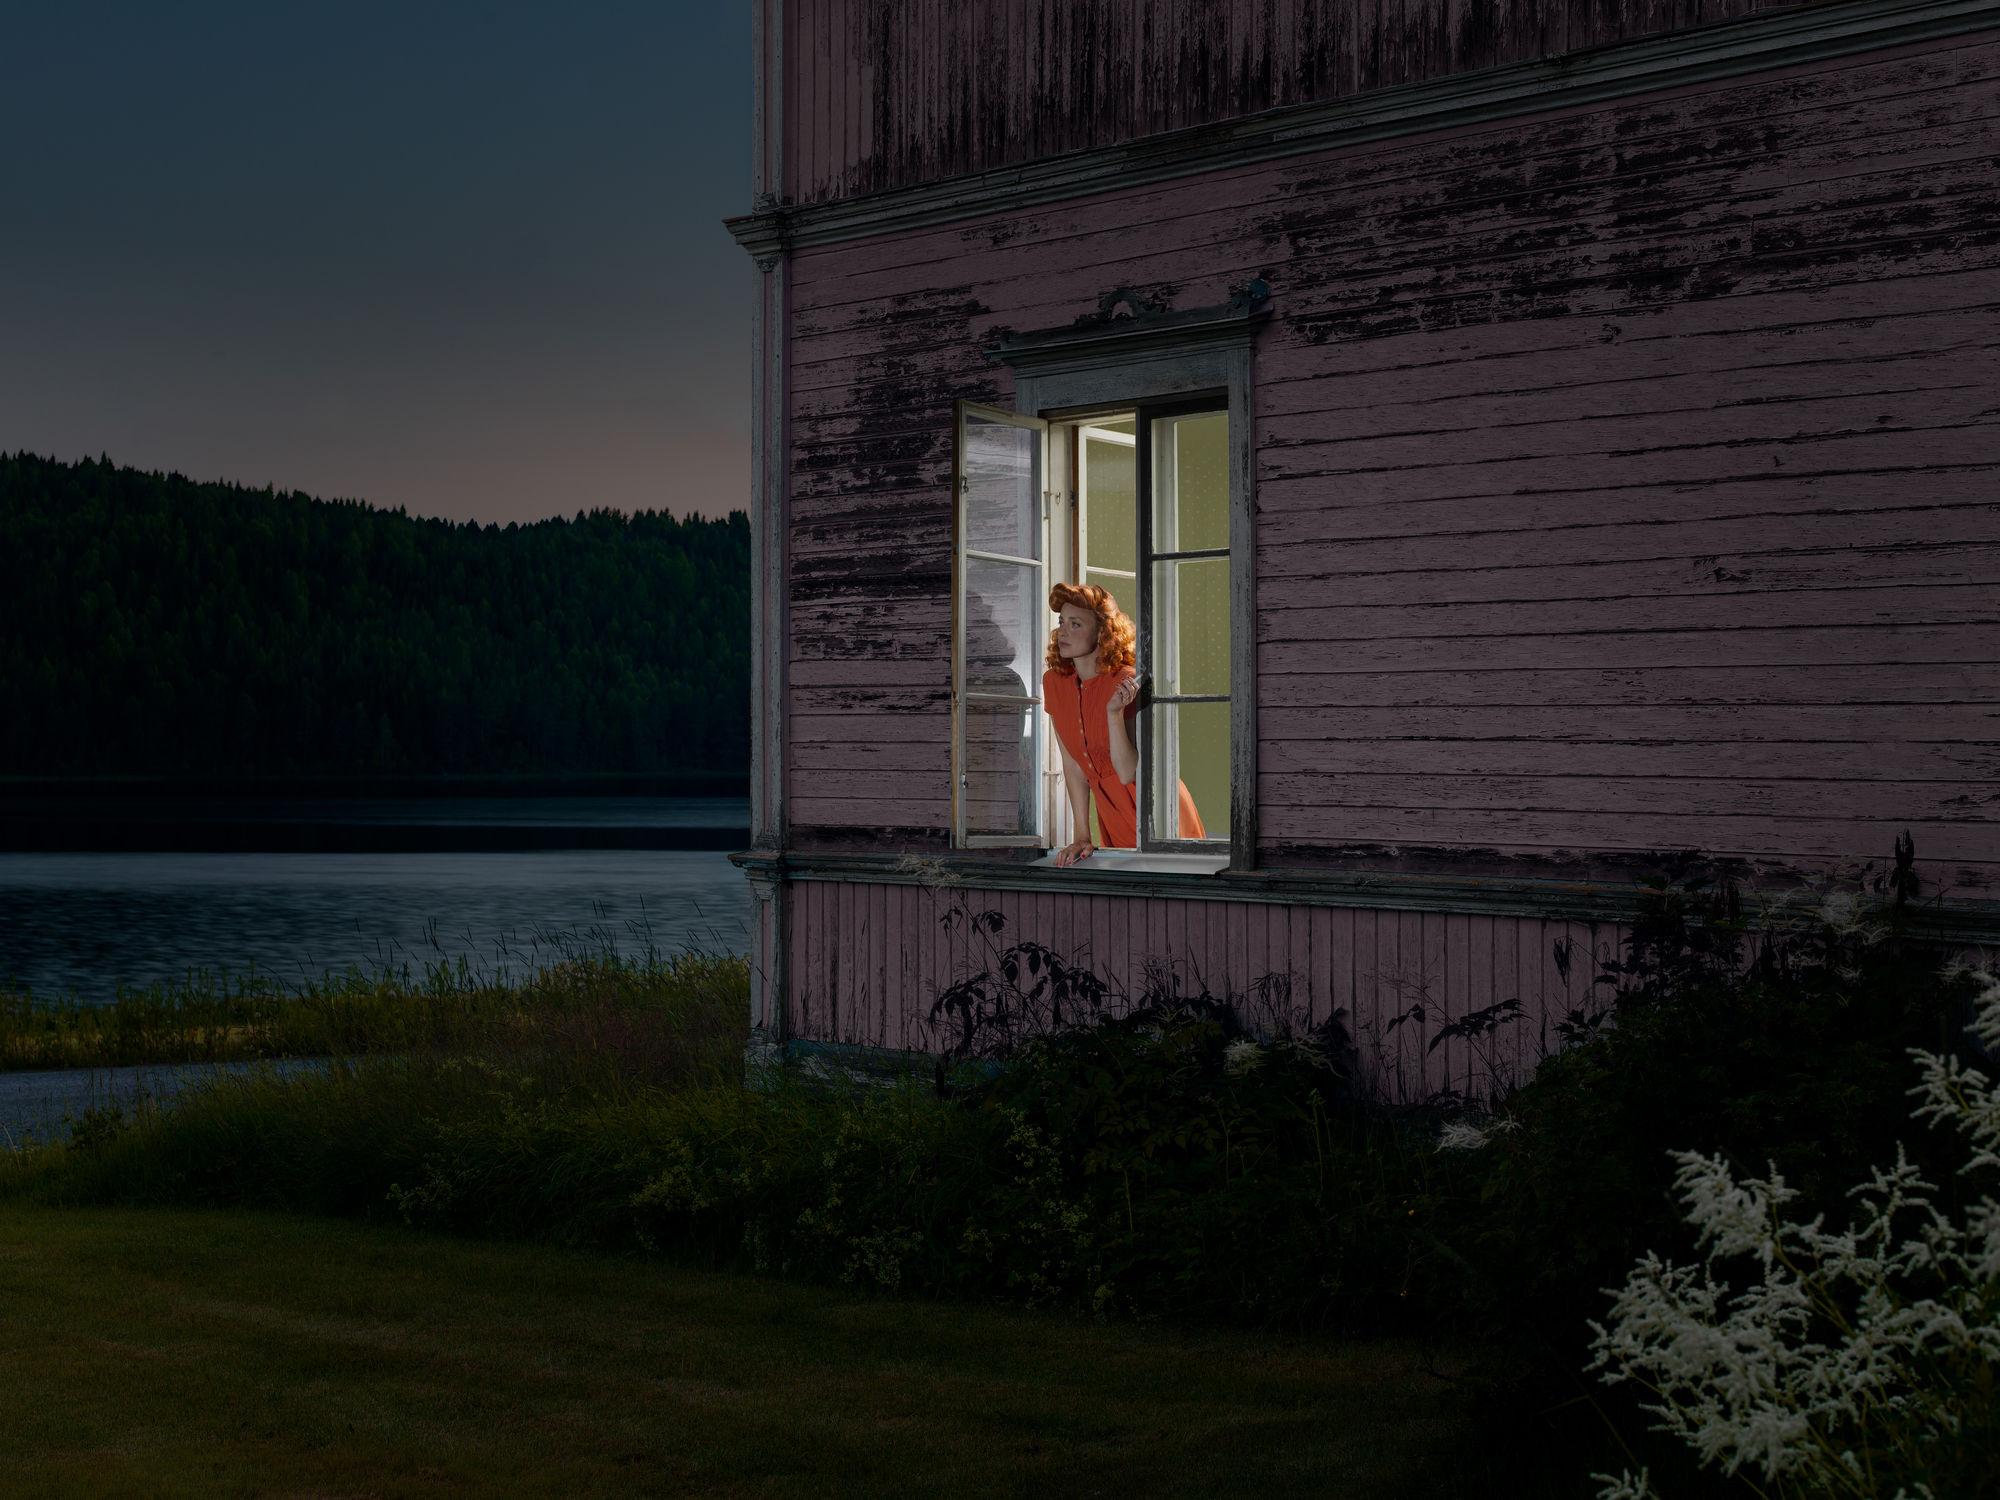 STEFAN RUHMKE | Holly Good Night